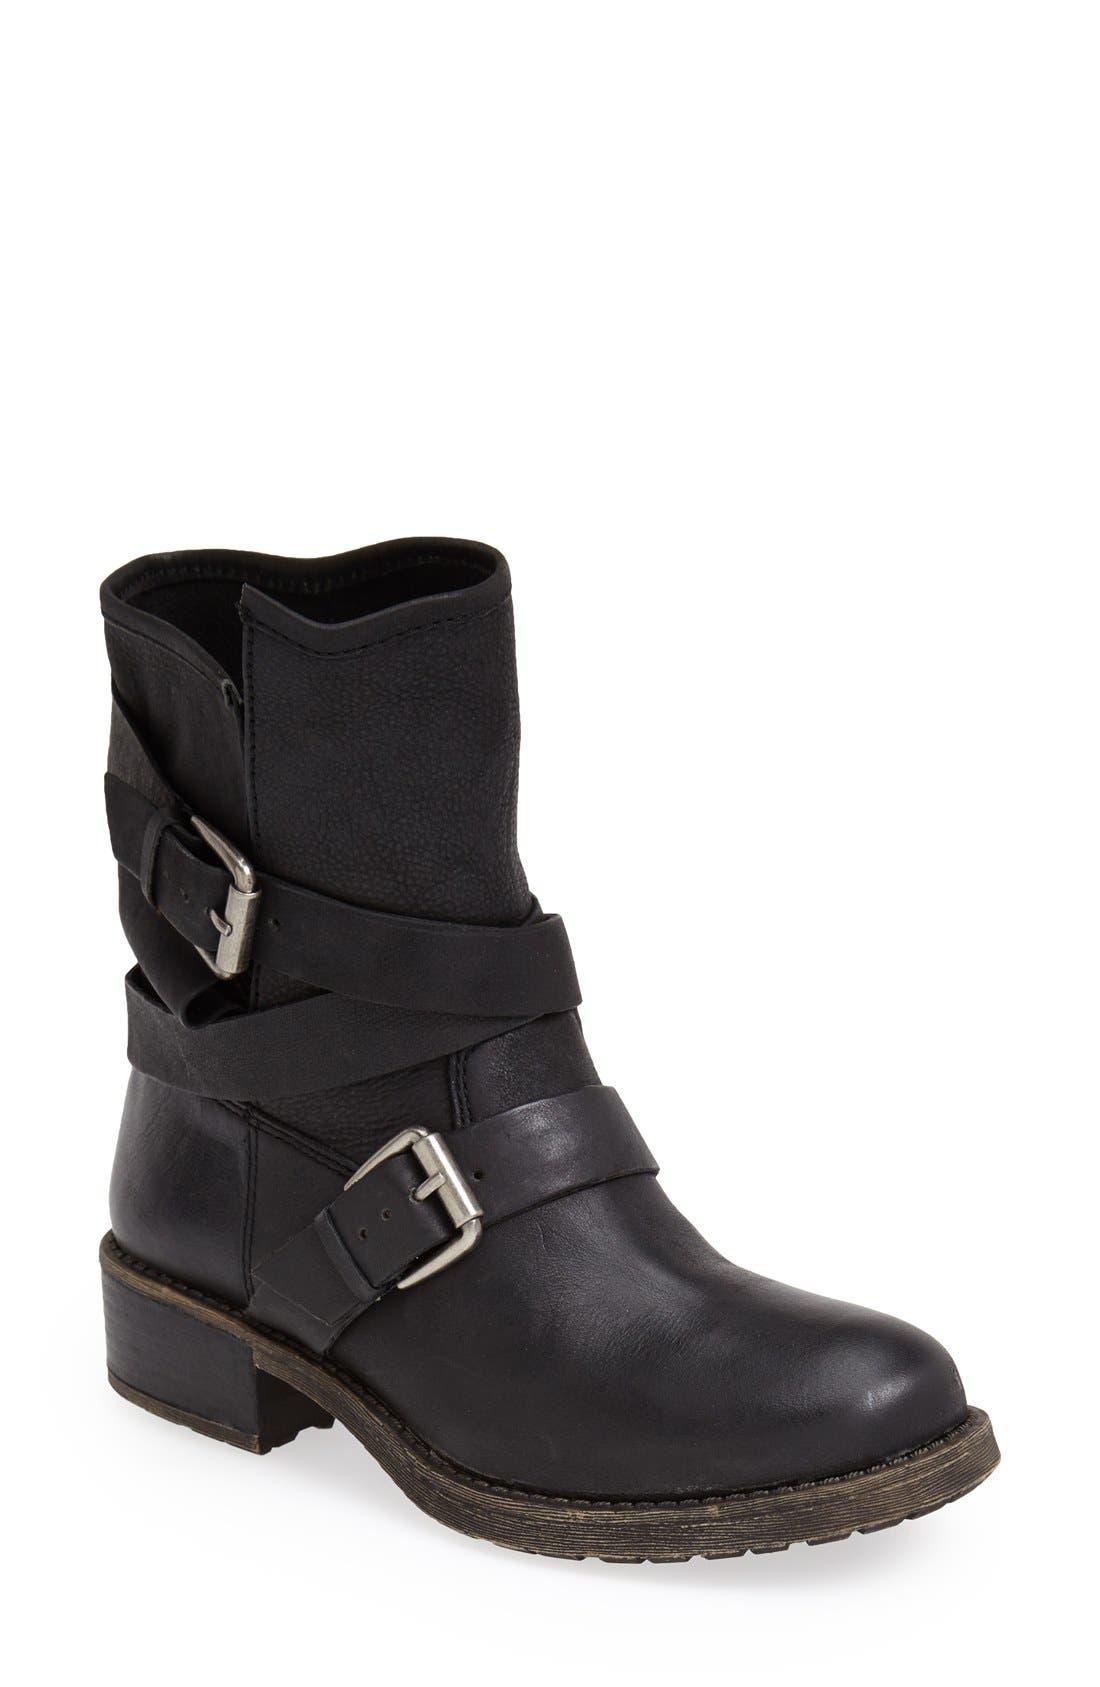 Main Image - Lucky Brand 'Dallis' Moto Boot (Women)